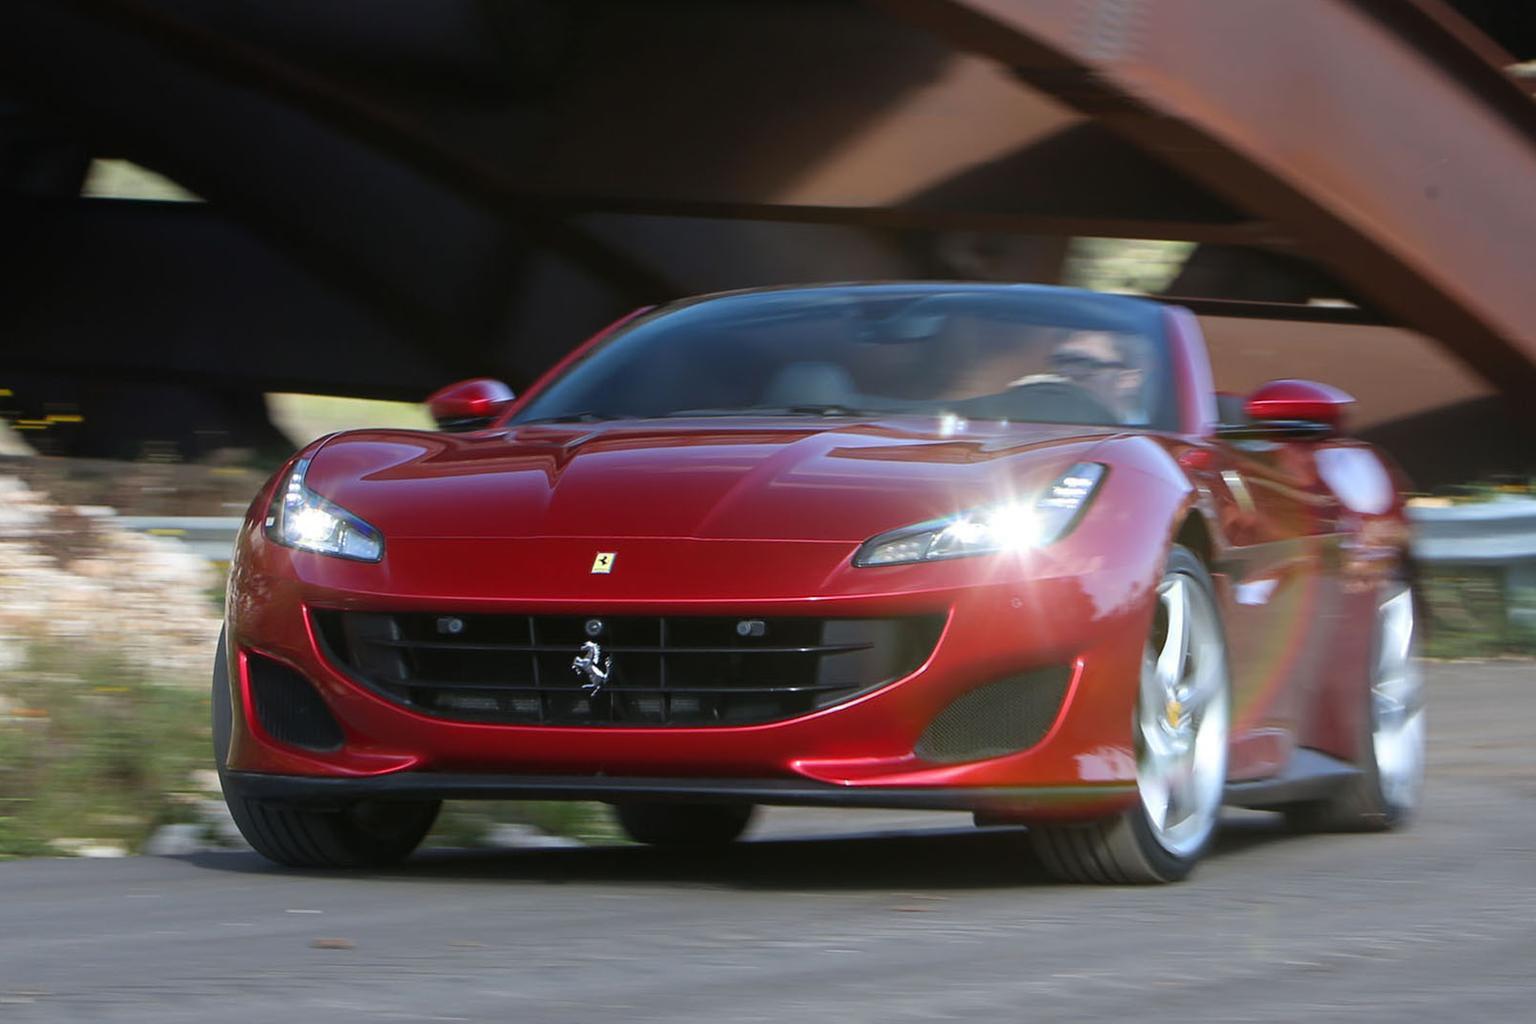 2018 Ferrari Portofino review - verdict